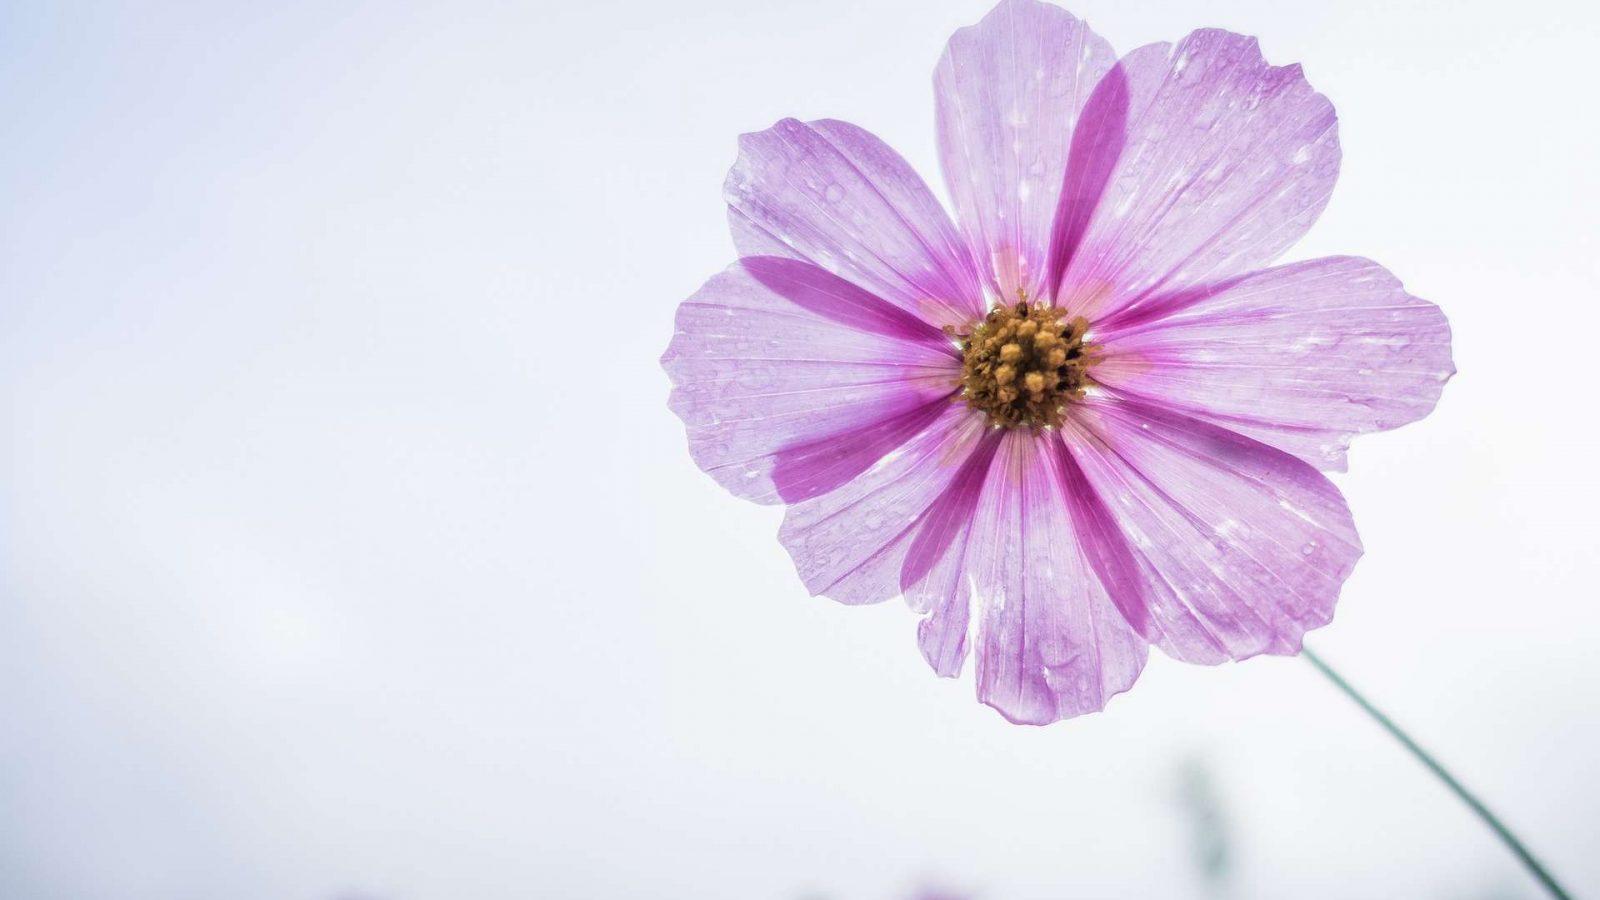 Hintergrundbild Blume